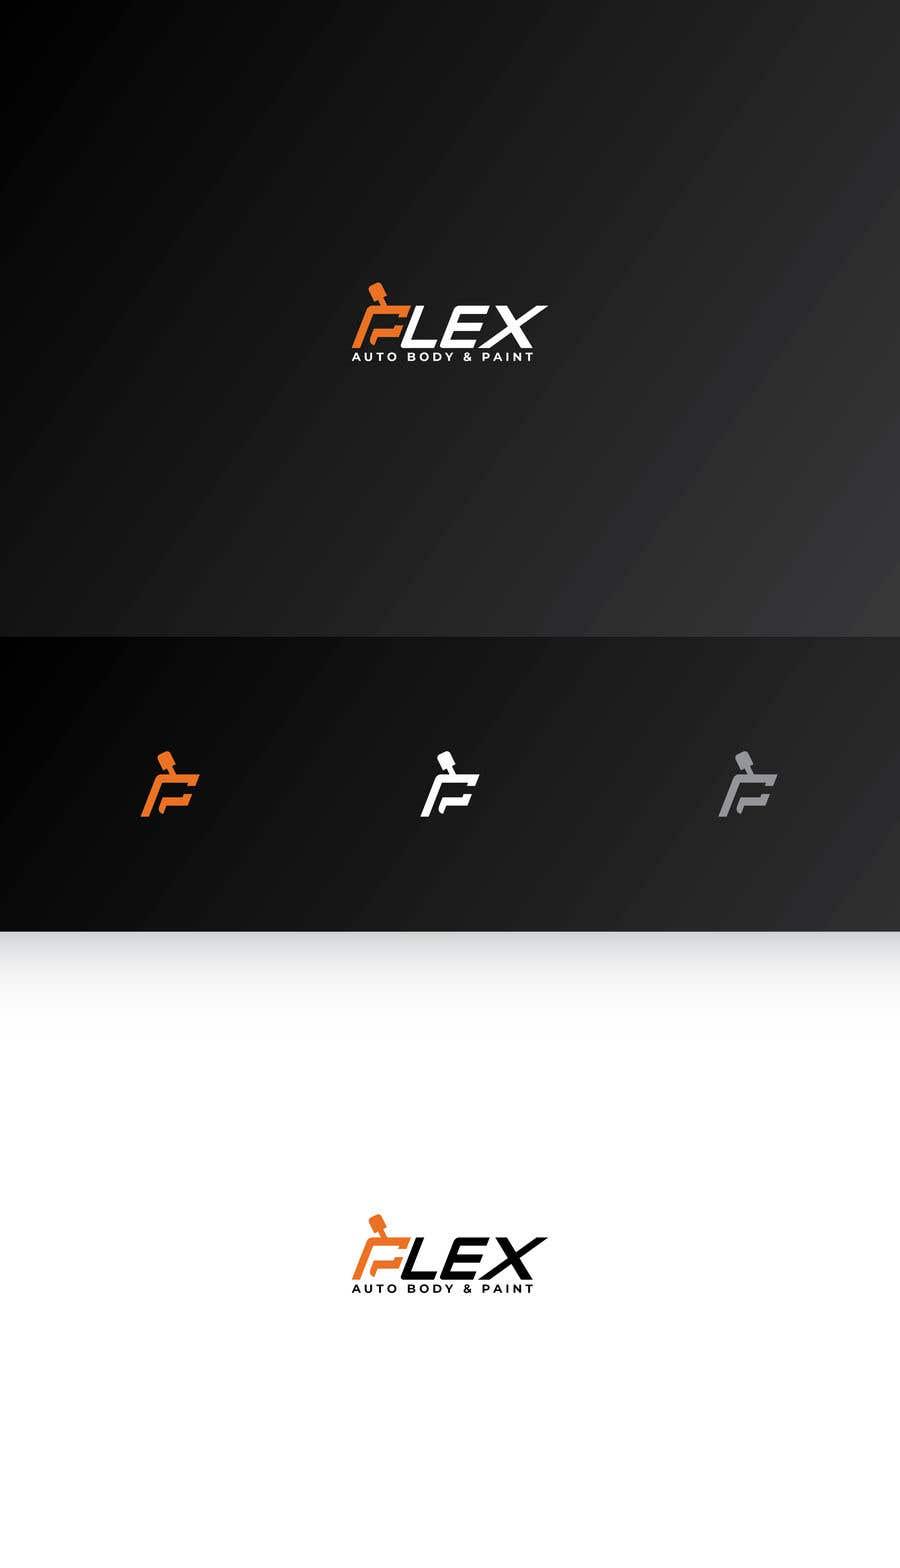 Penyertaan Peraduan #247 untuk Design a Logo for an Auto Body Business